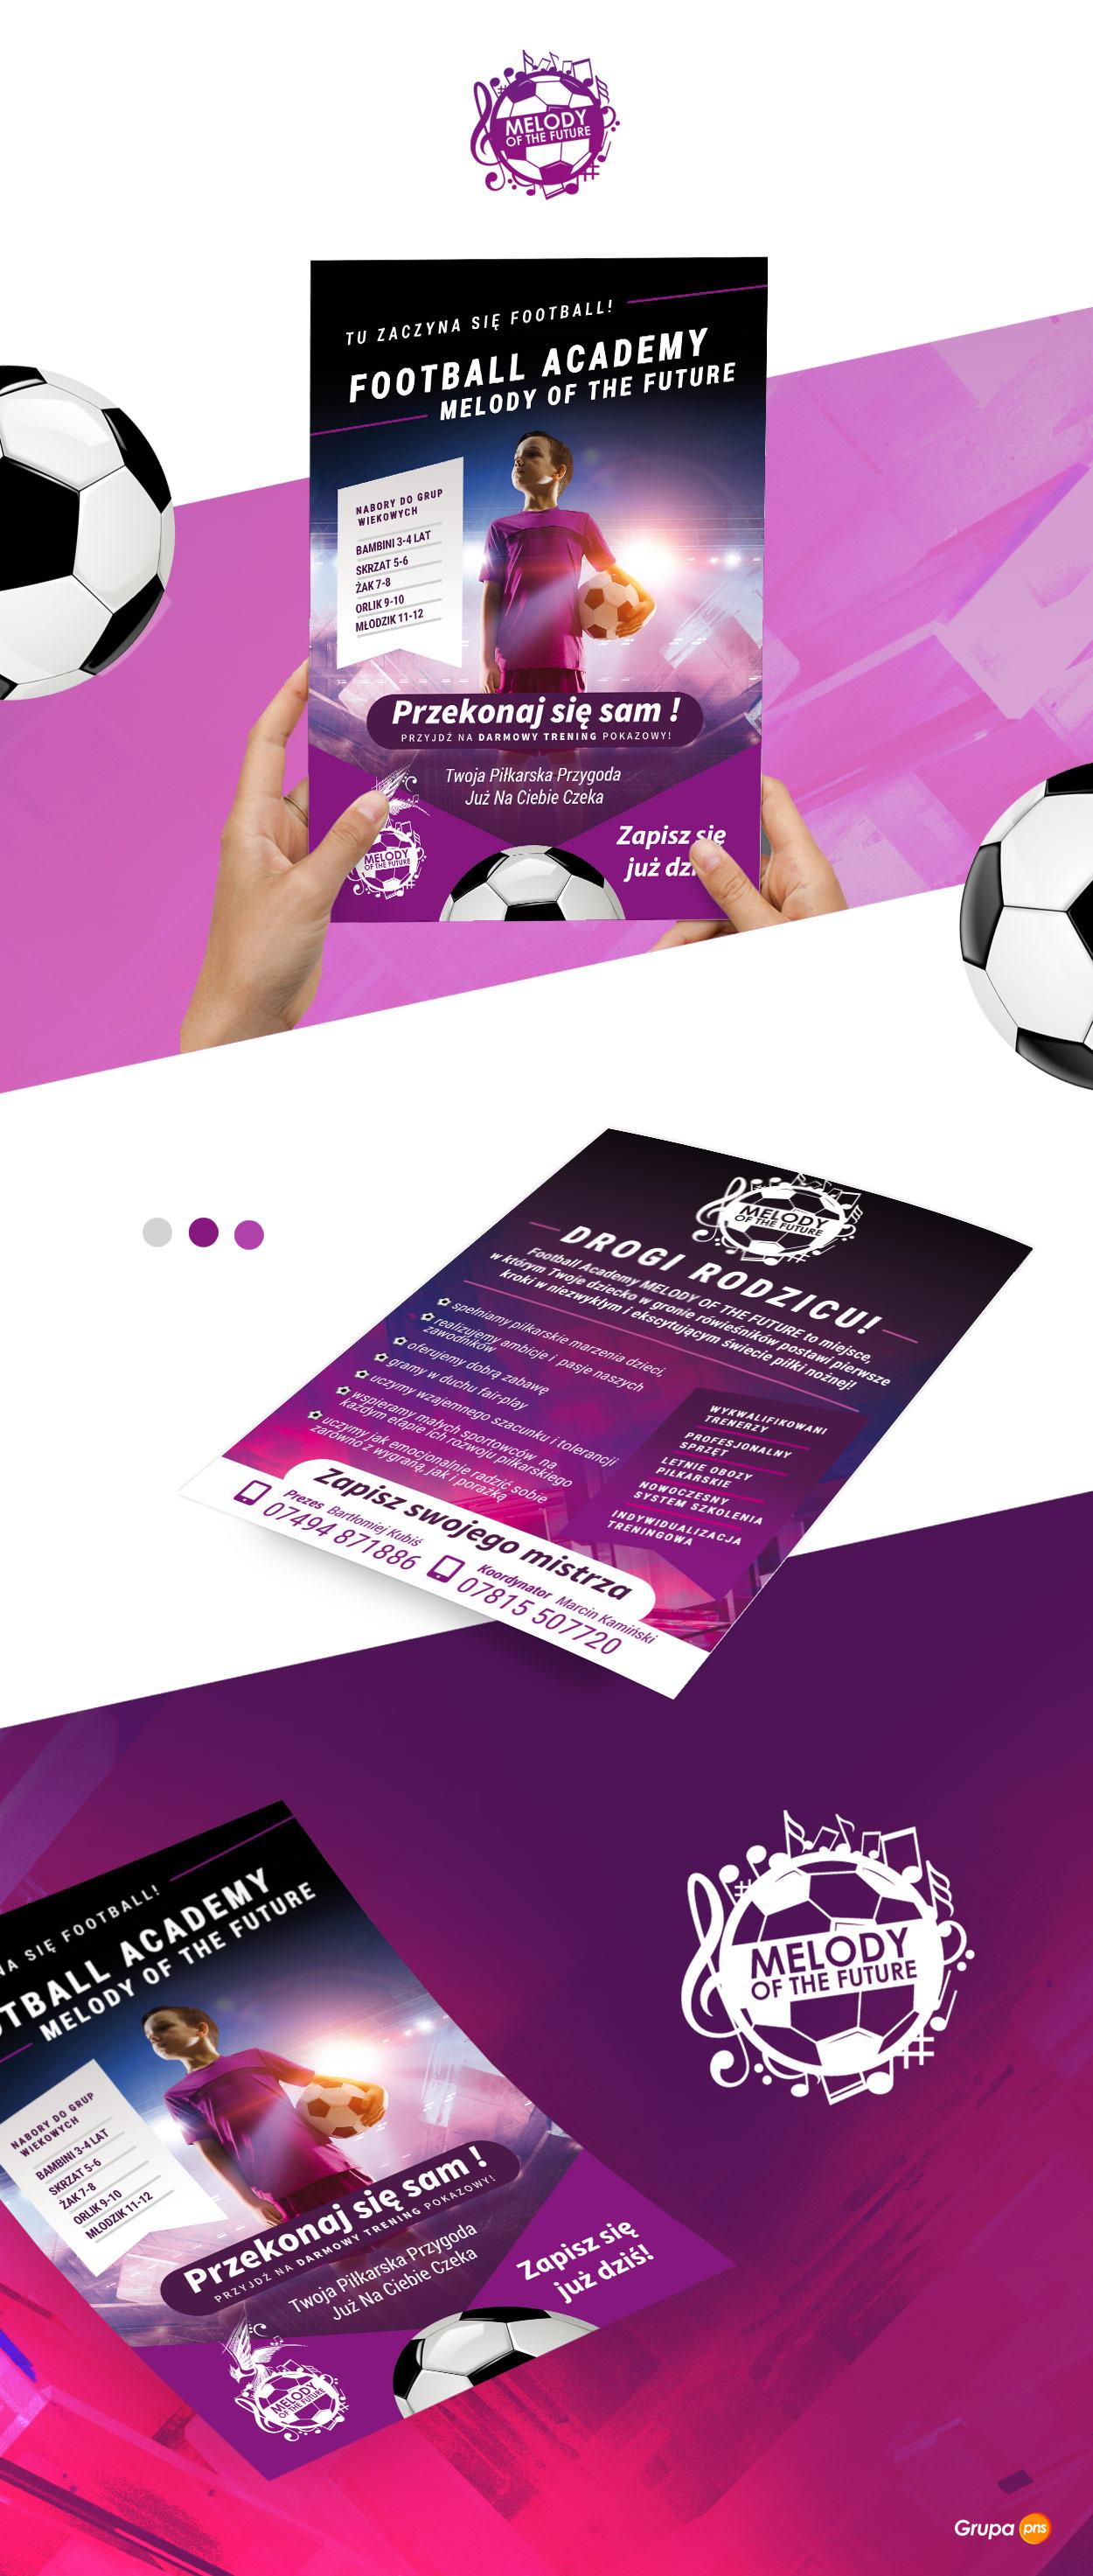 melody ulotka - Projekt ulotki reklamowej - Football Academy Melody